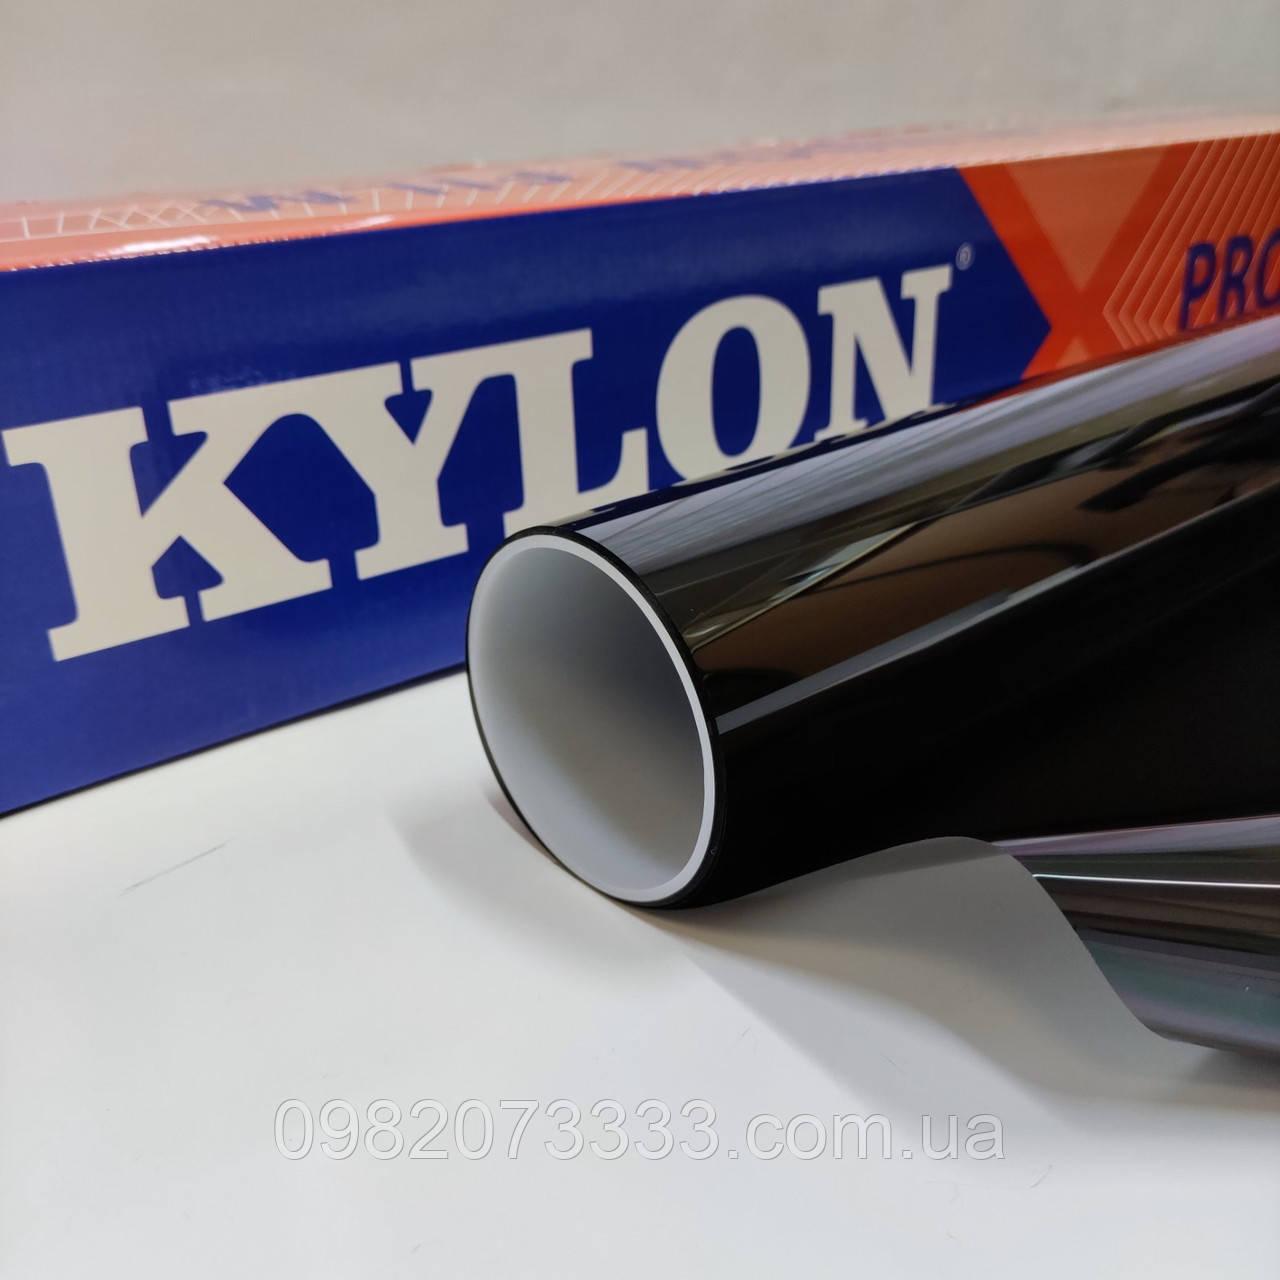 Металлизированная HP Standart 15 Kylon автомобильная тонировочная плёнка ширина рулон 1,524 (цена за кв.м.)